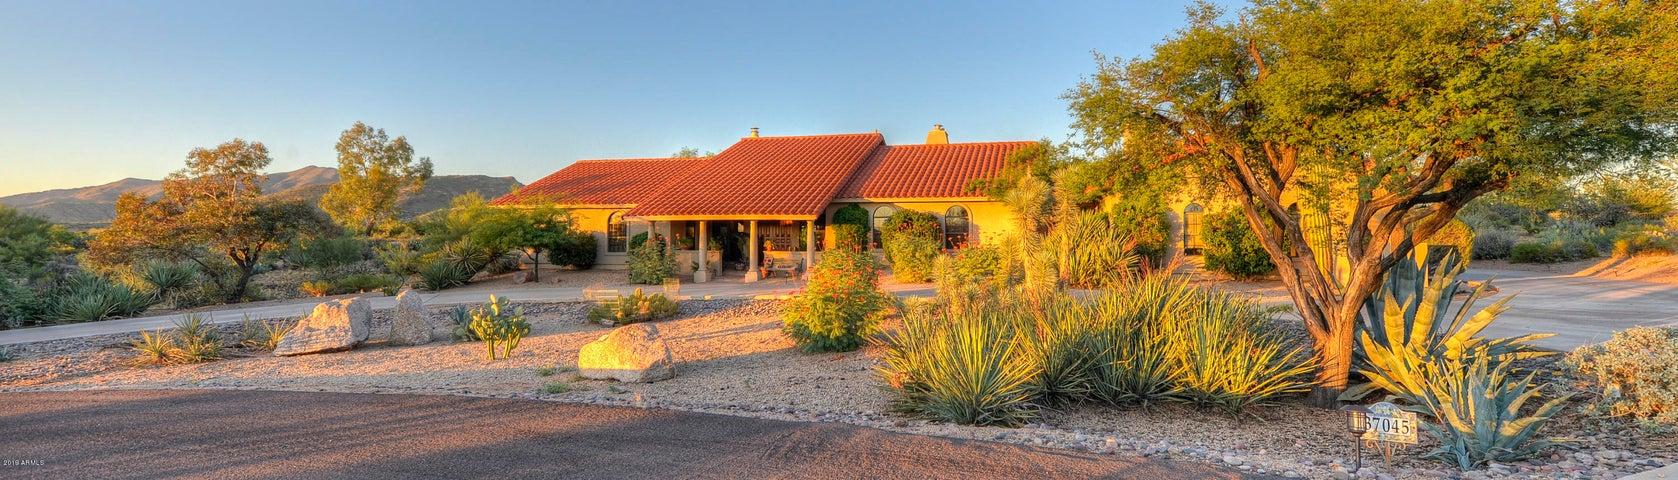 37045 N ROMPING Road, Carefree, AZ 85377